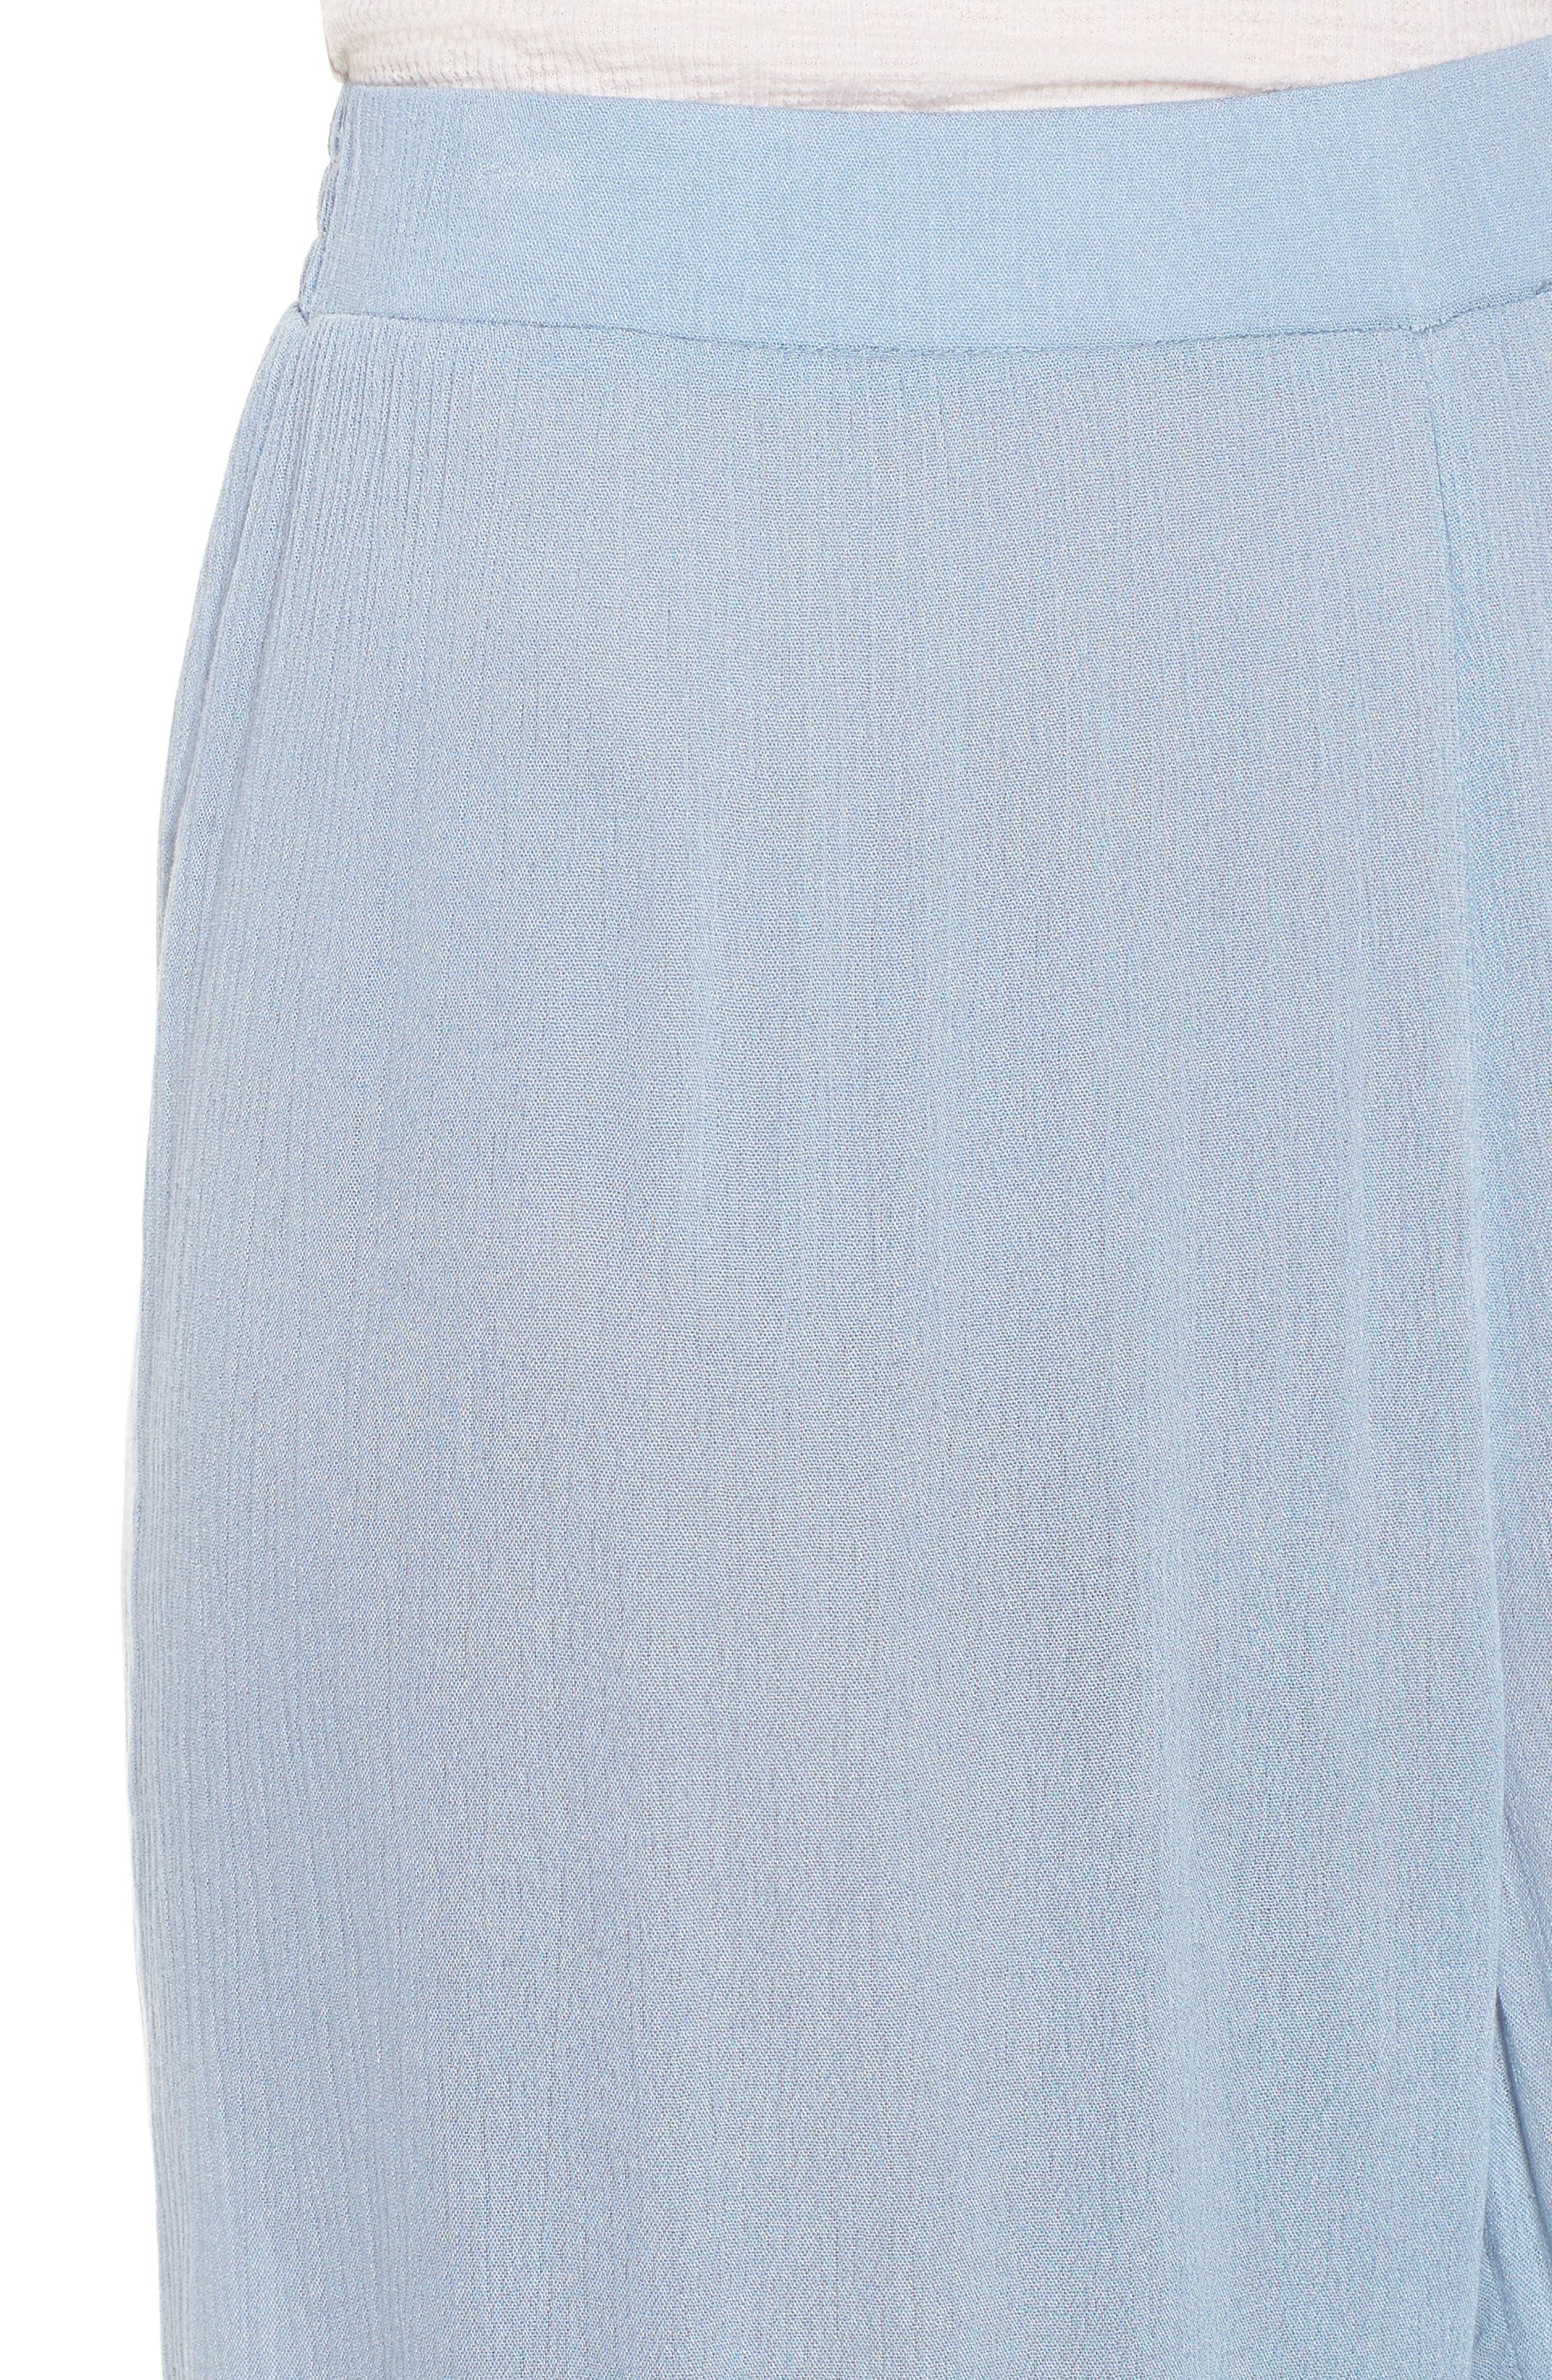 Mystique Ruffle Hem Beach Pants,                             Alternate thumbnail 6, color,                             Blue